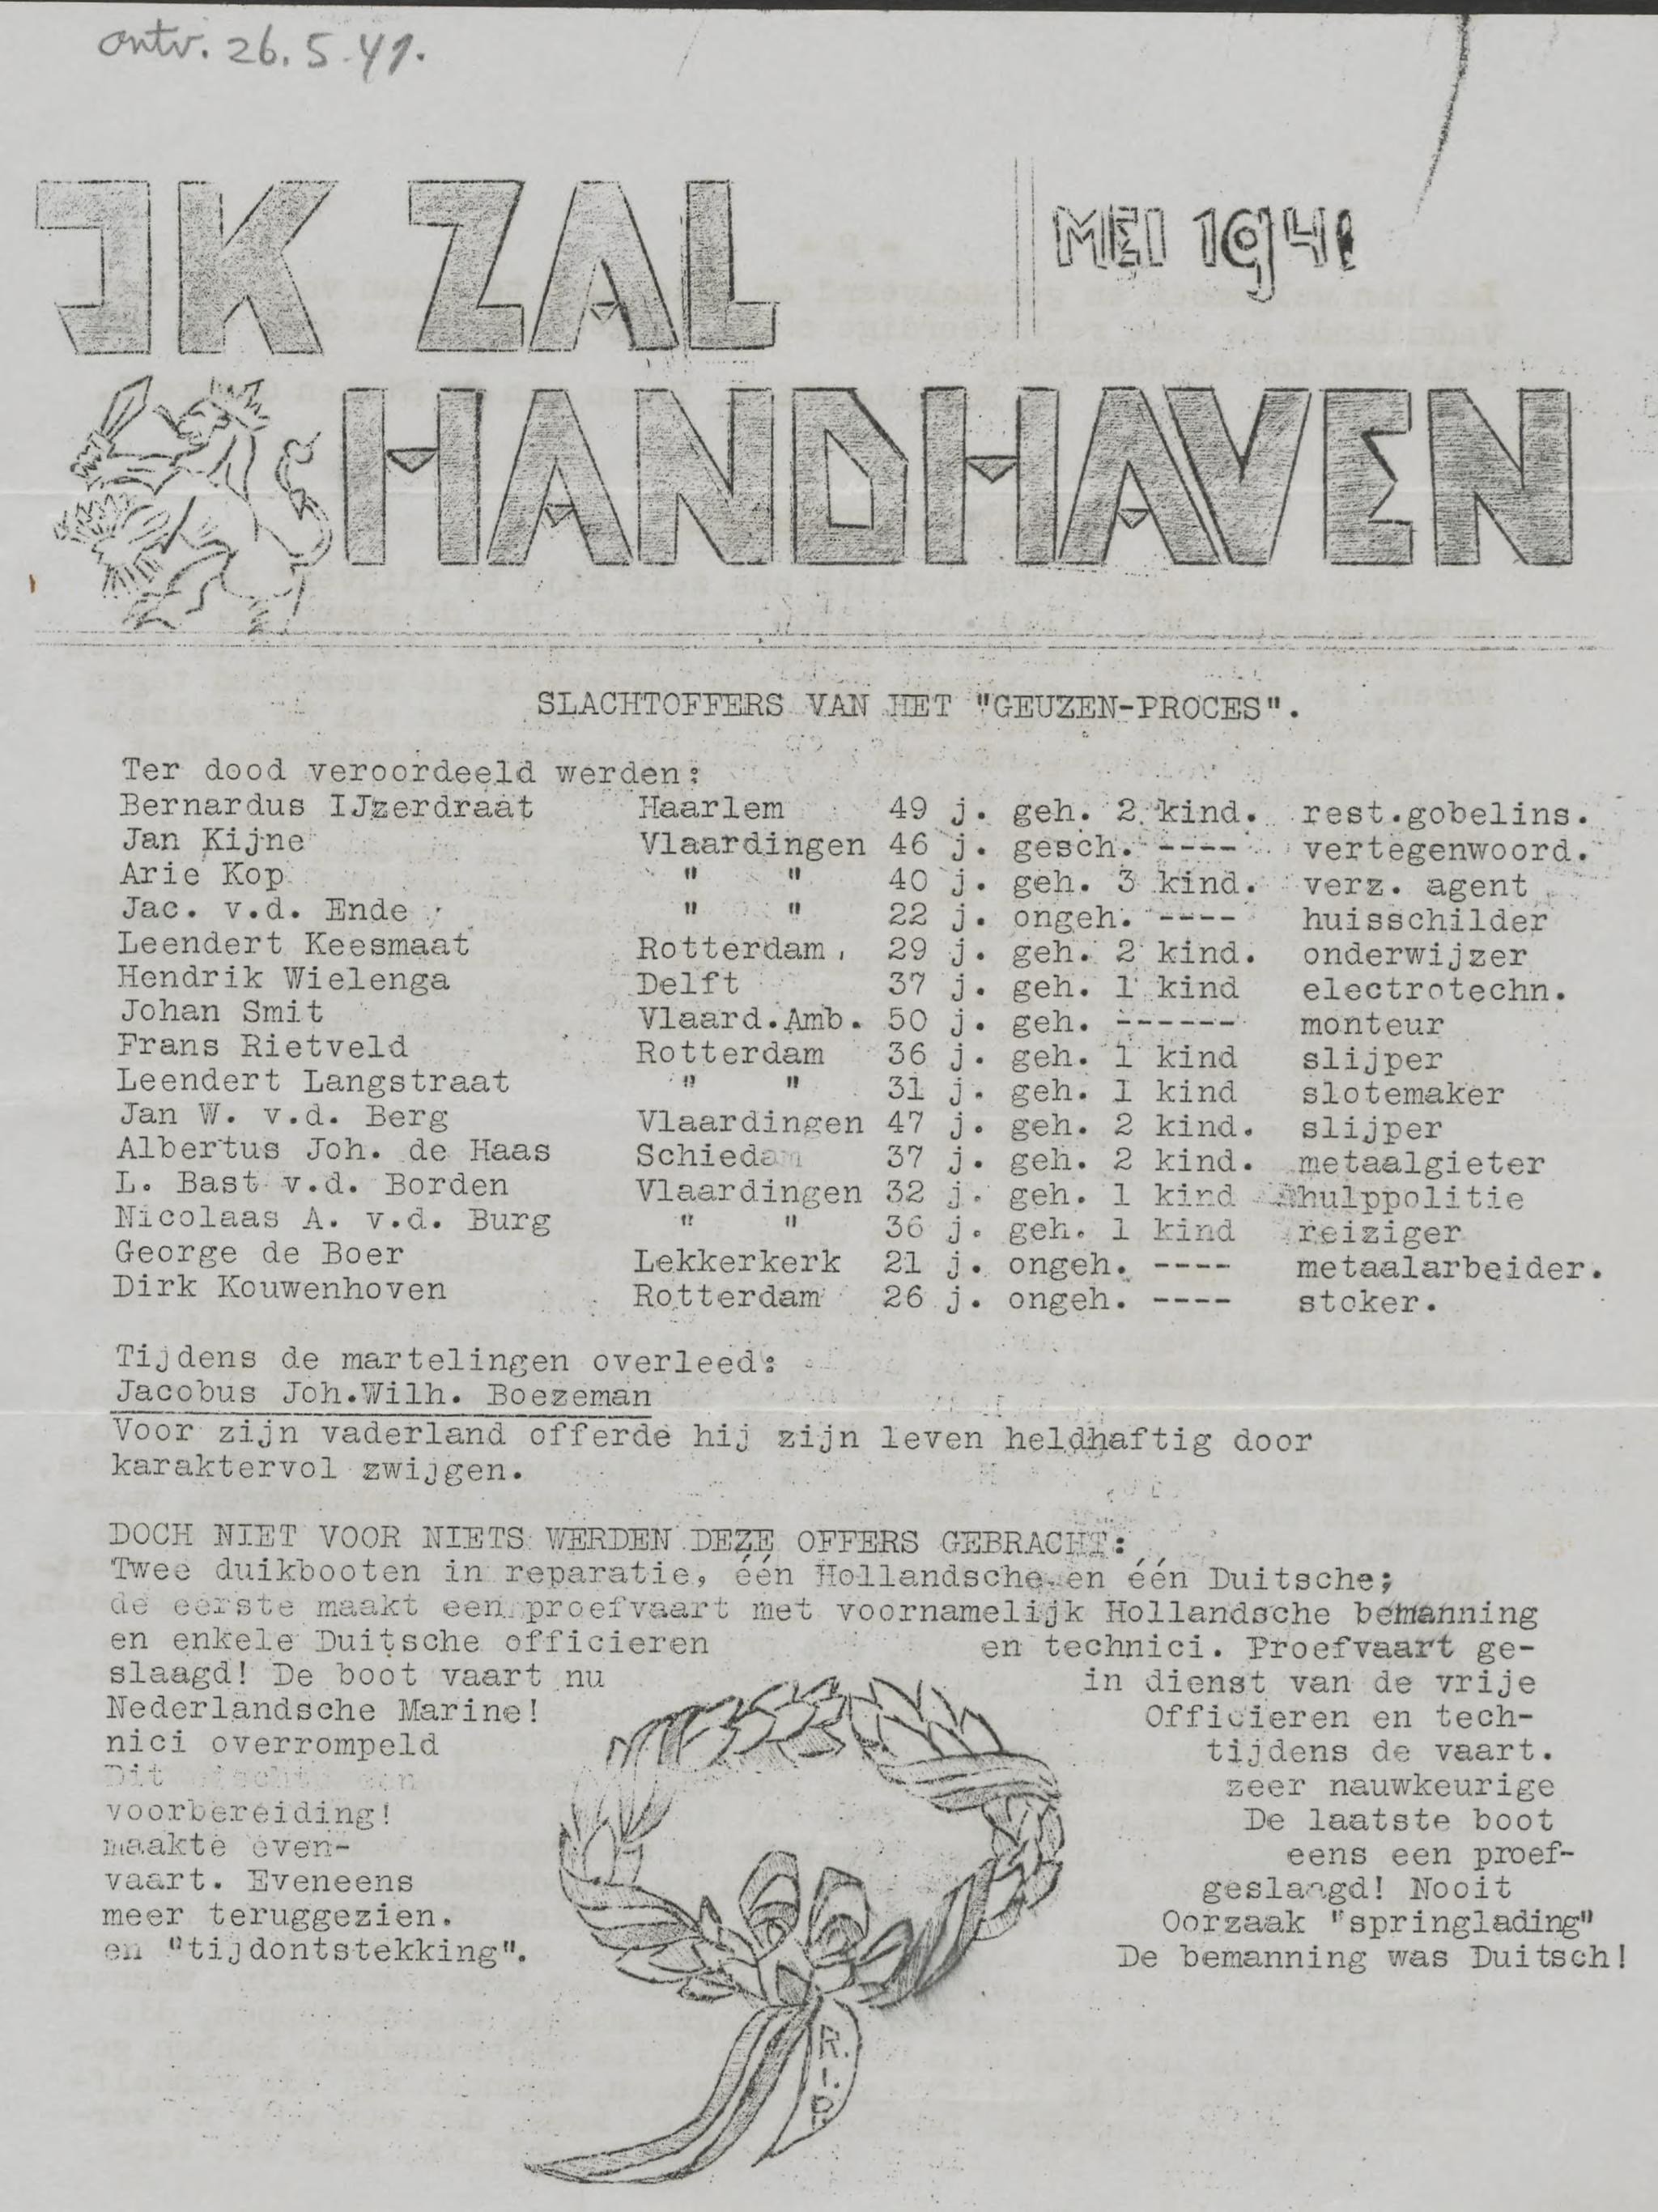 Ik zal handhaven, 15 mei 1941